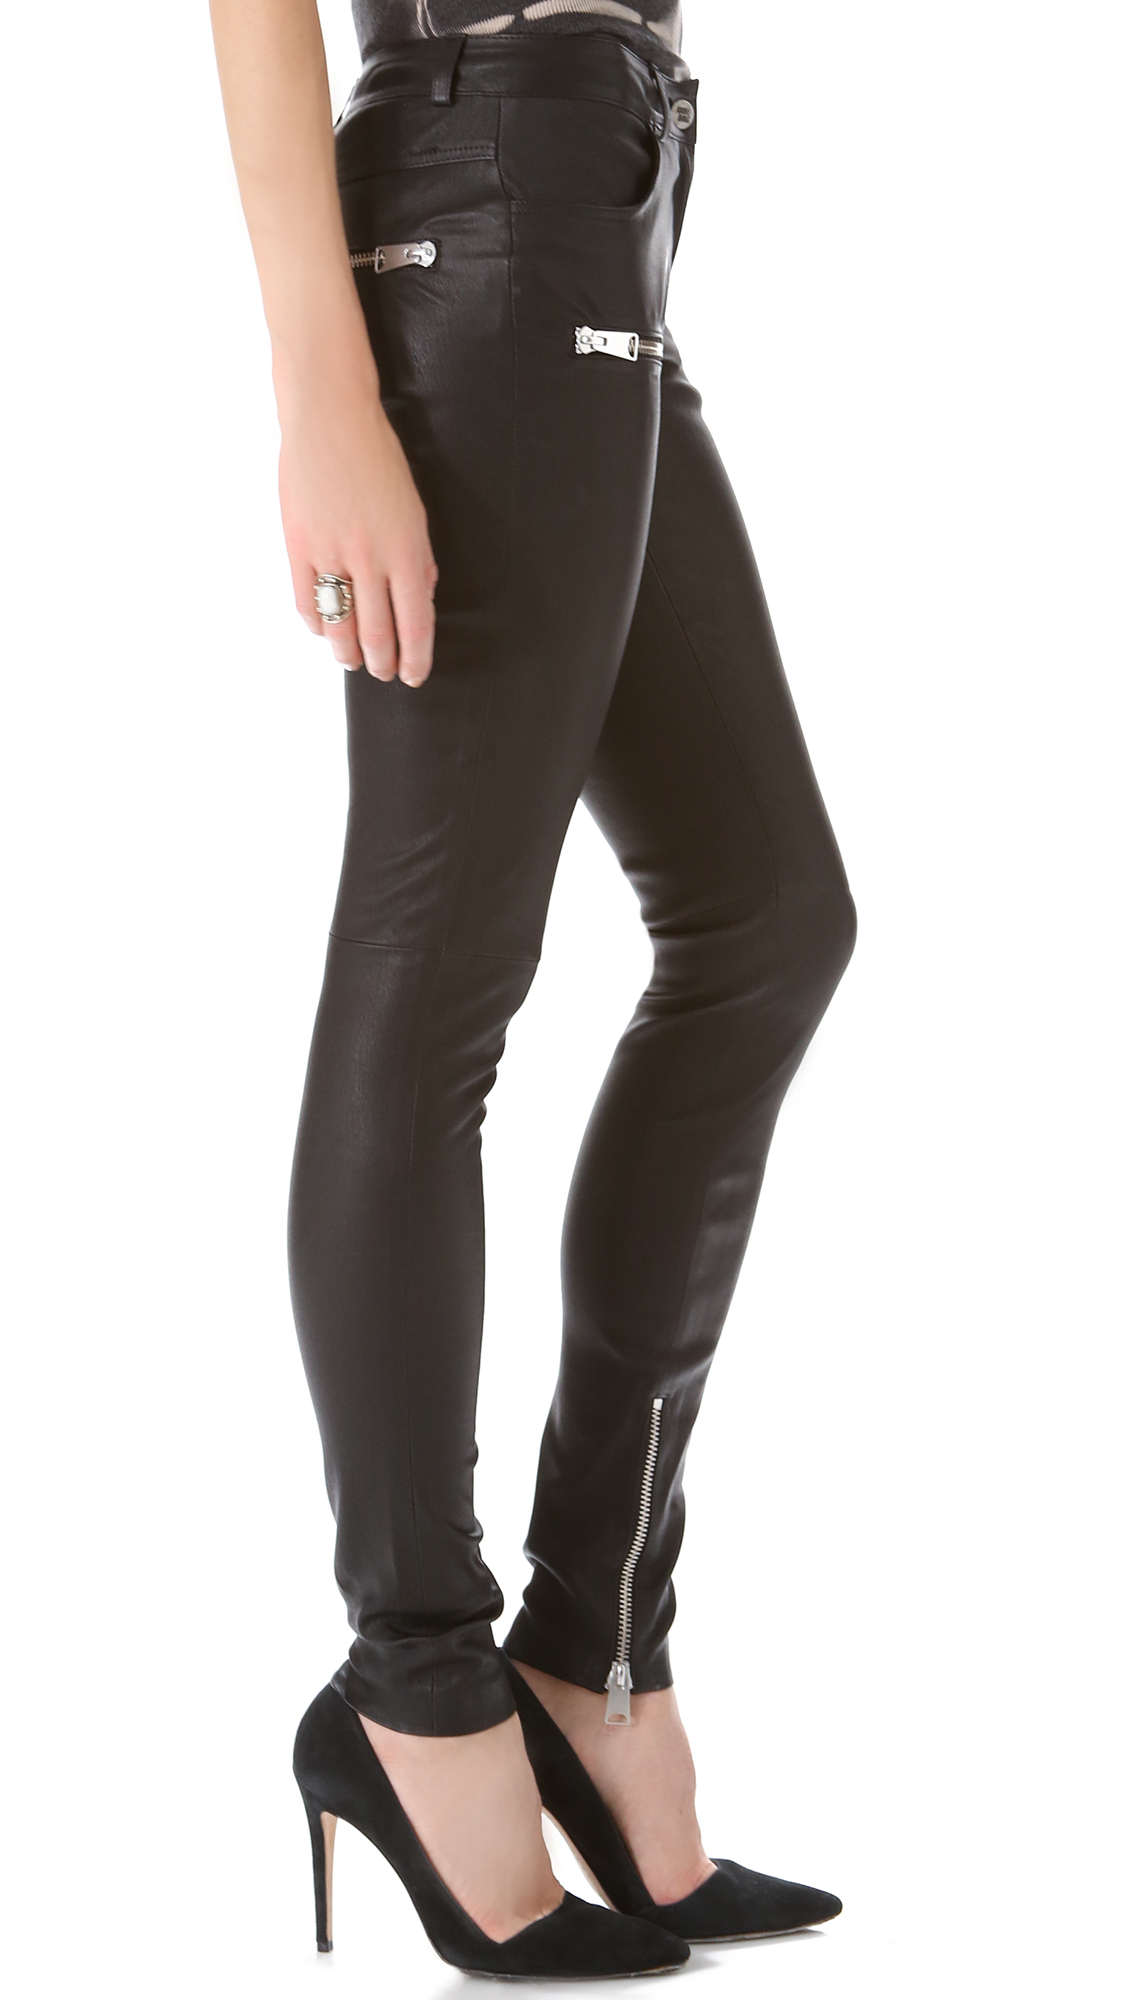 International Concepts INC Women's Curvy Faux-Leather-Trim Pants (2, Deep Black) Sold by Rennde. $ $ International Concepts INC Women's Curvy Faux-Leather-Trim Pants (4, Deep Black) Bluelans Women Faux Leather Stretch Skinny Pants Leggings Plus Size Slim Fashion Trousers.